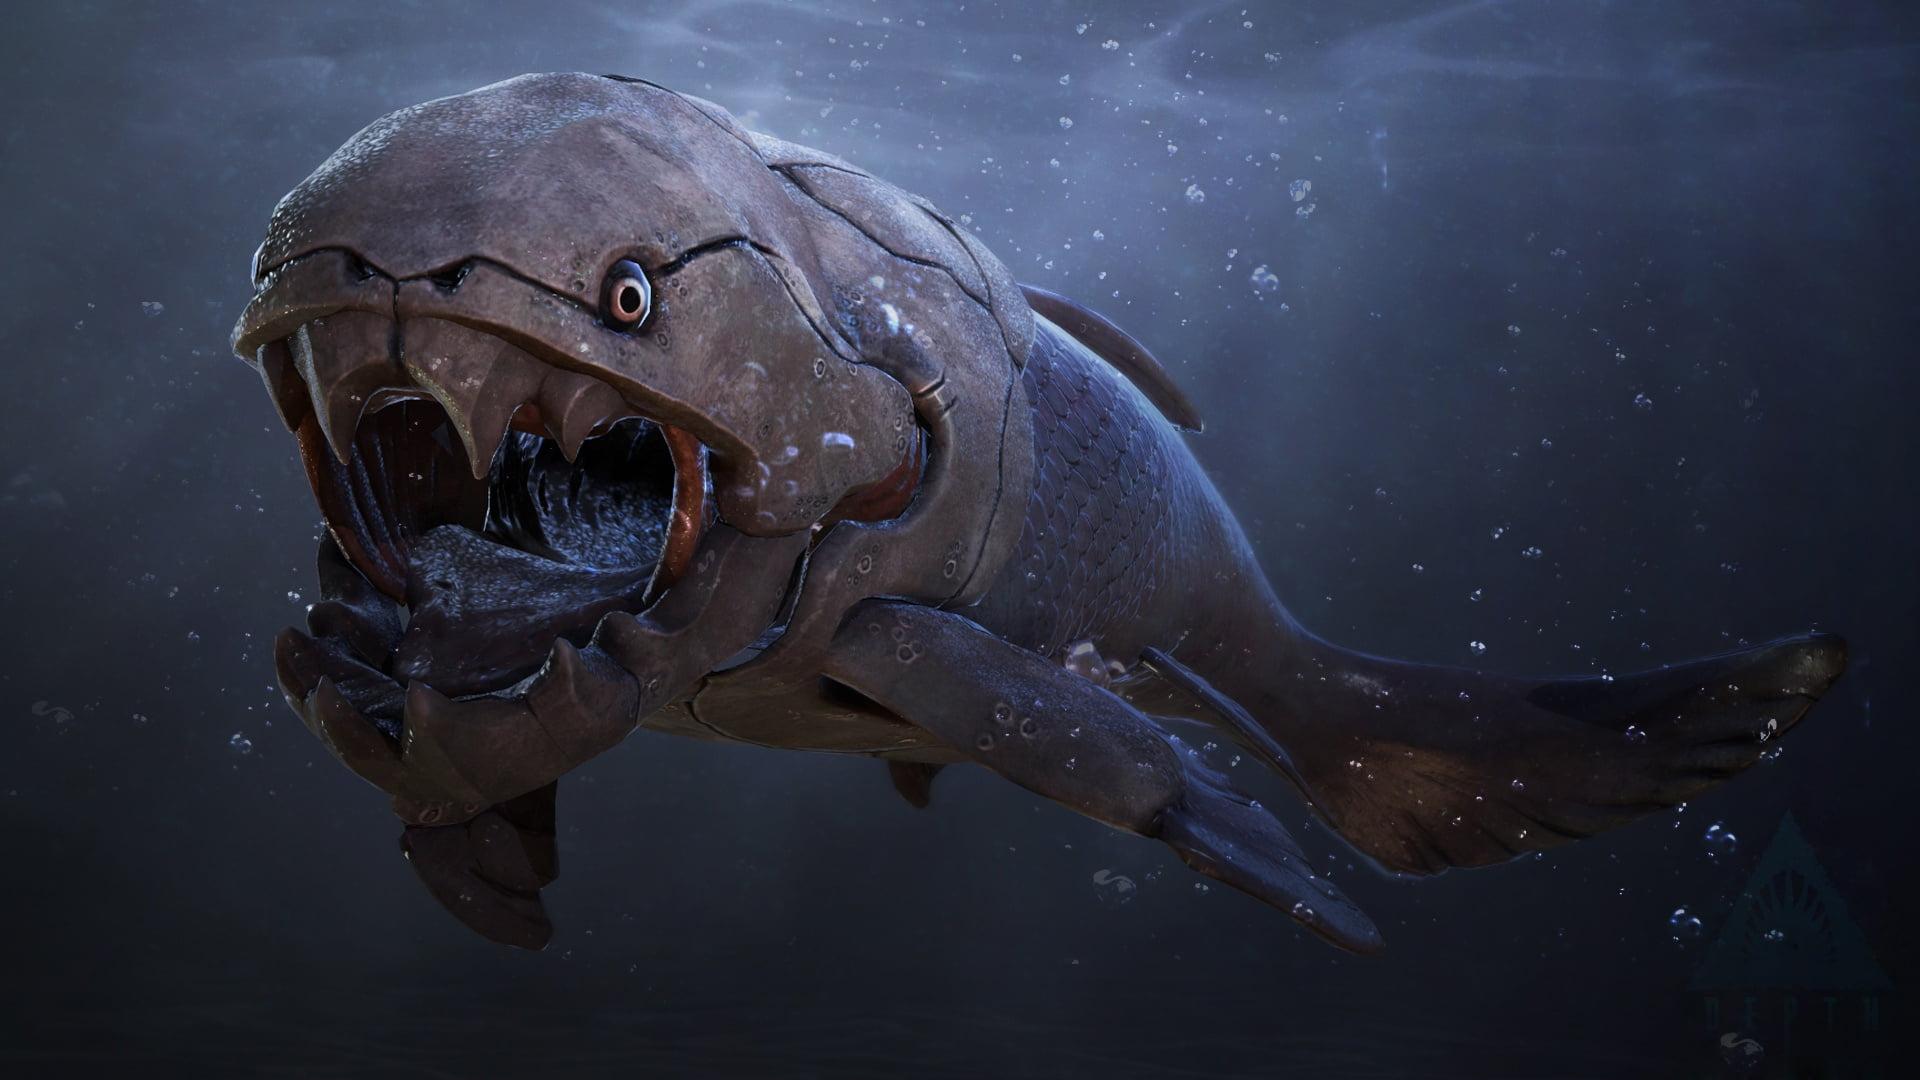 Gray and black fish digital wallpaper fantasy art creature 1920x1080